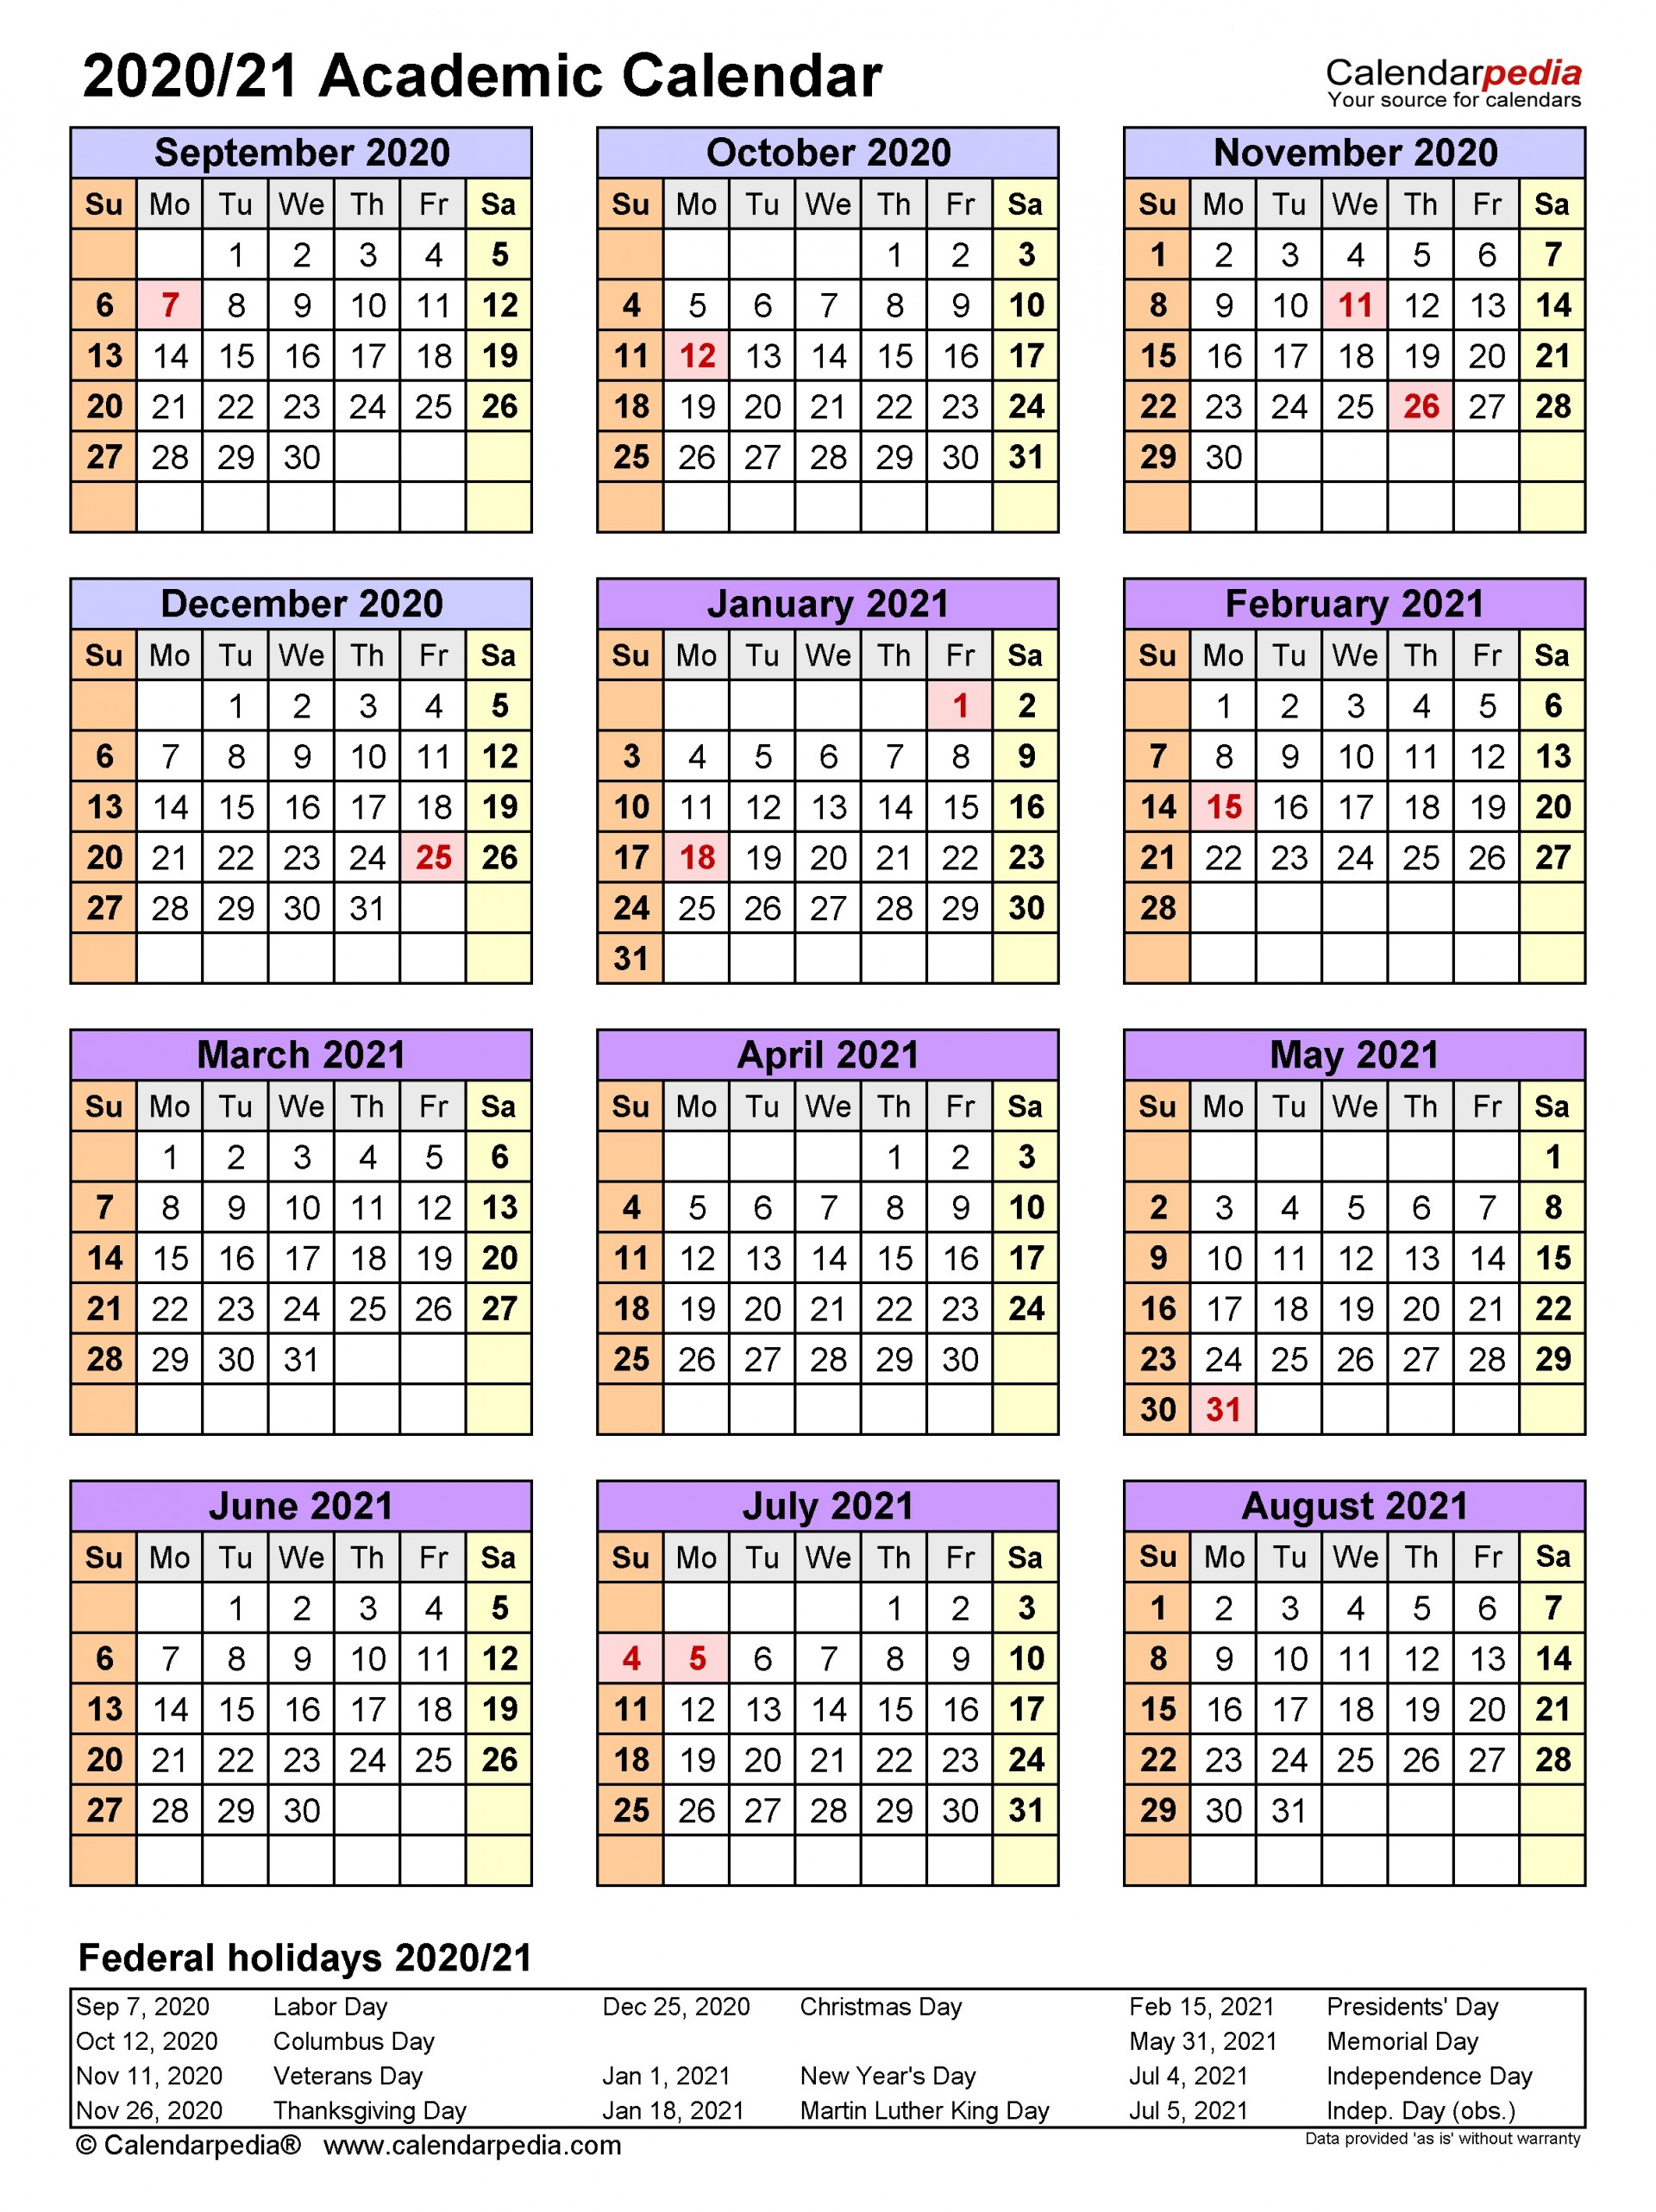 002 Remarkable School Year Calendar Template High Resolution  Excel 2019-20 Word1920